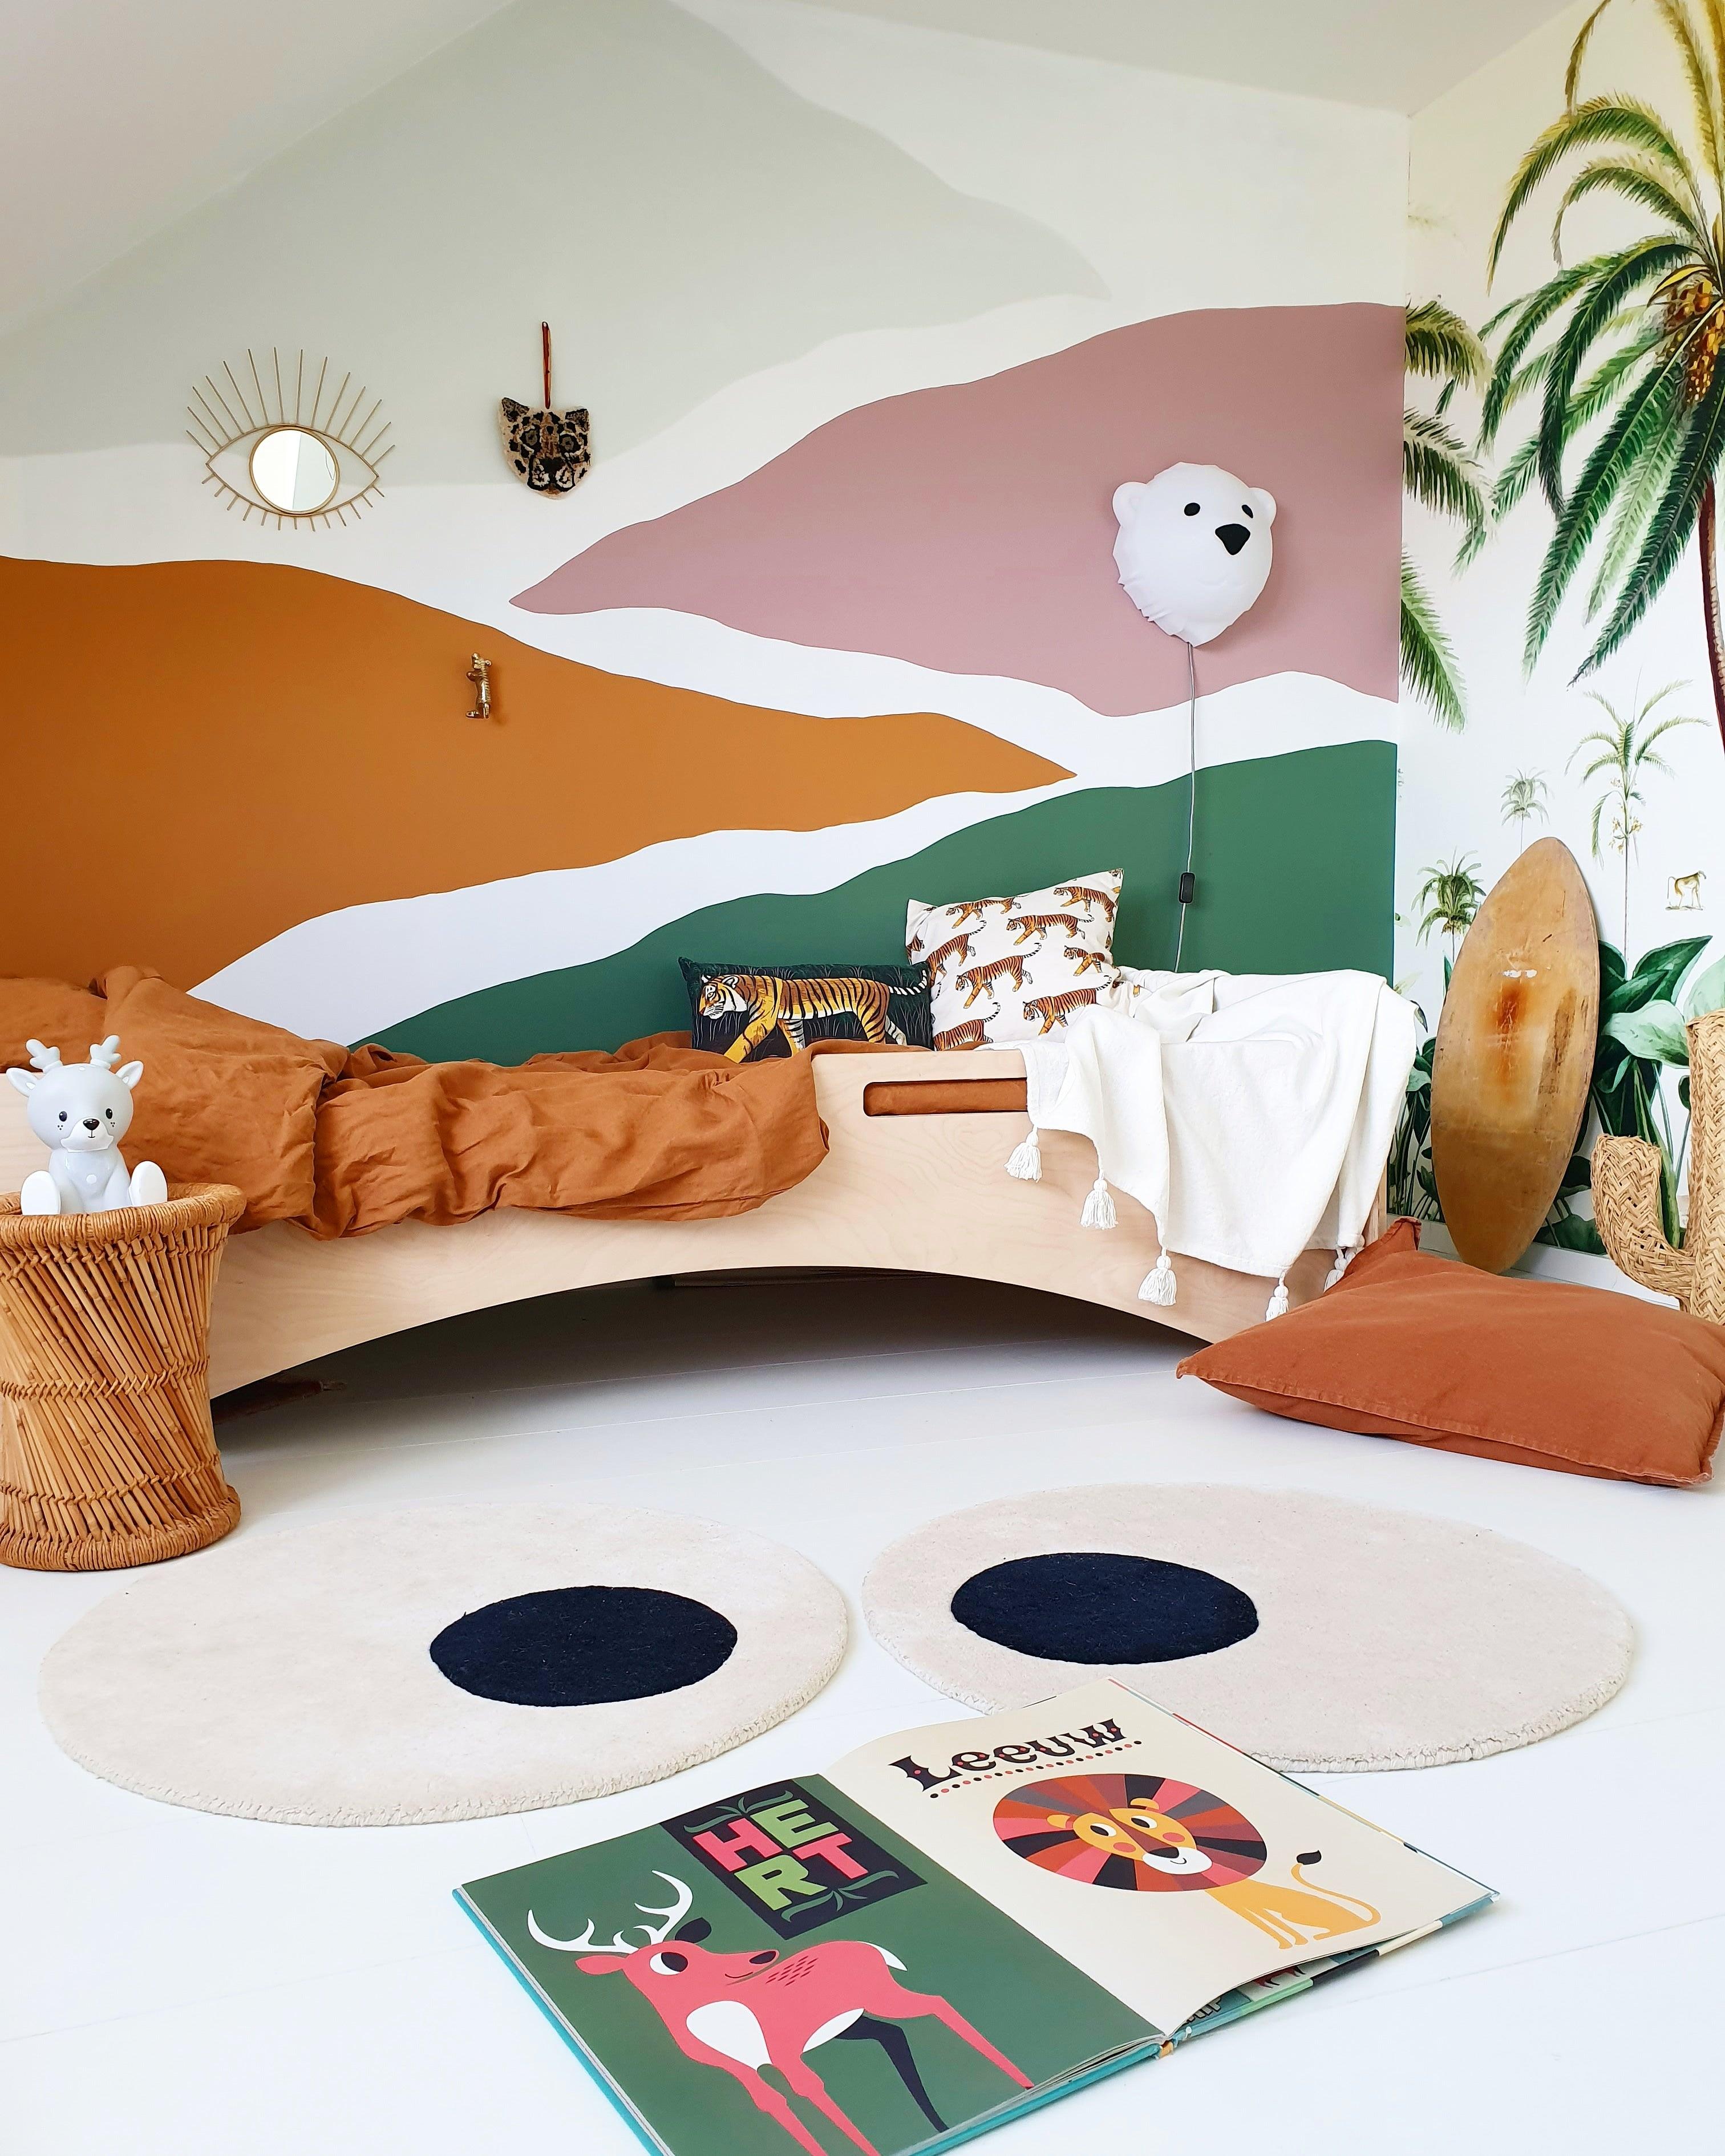 Terracotta rooms - kids bedroom with multi-colorerd paint blocks